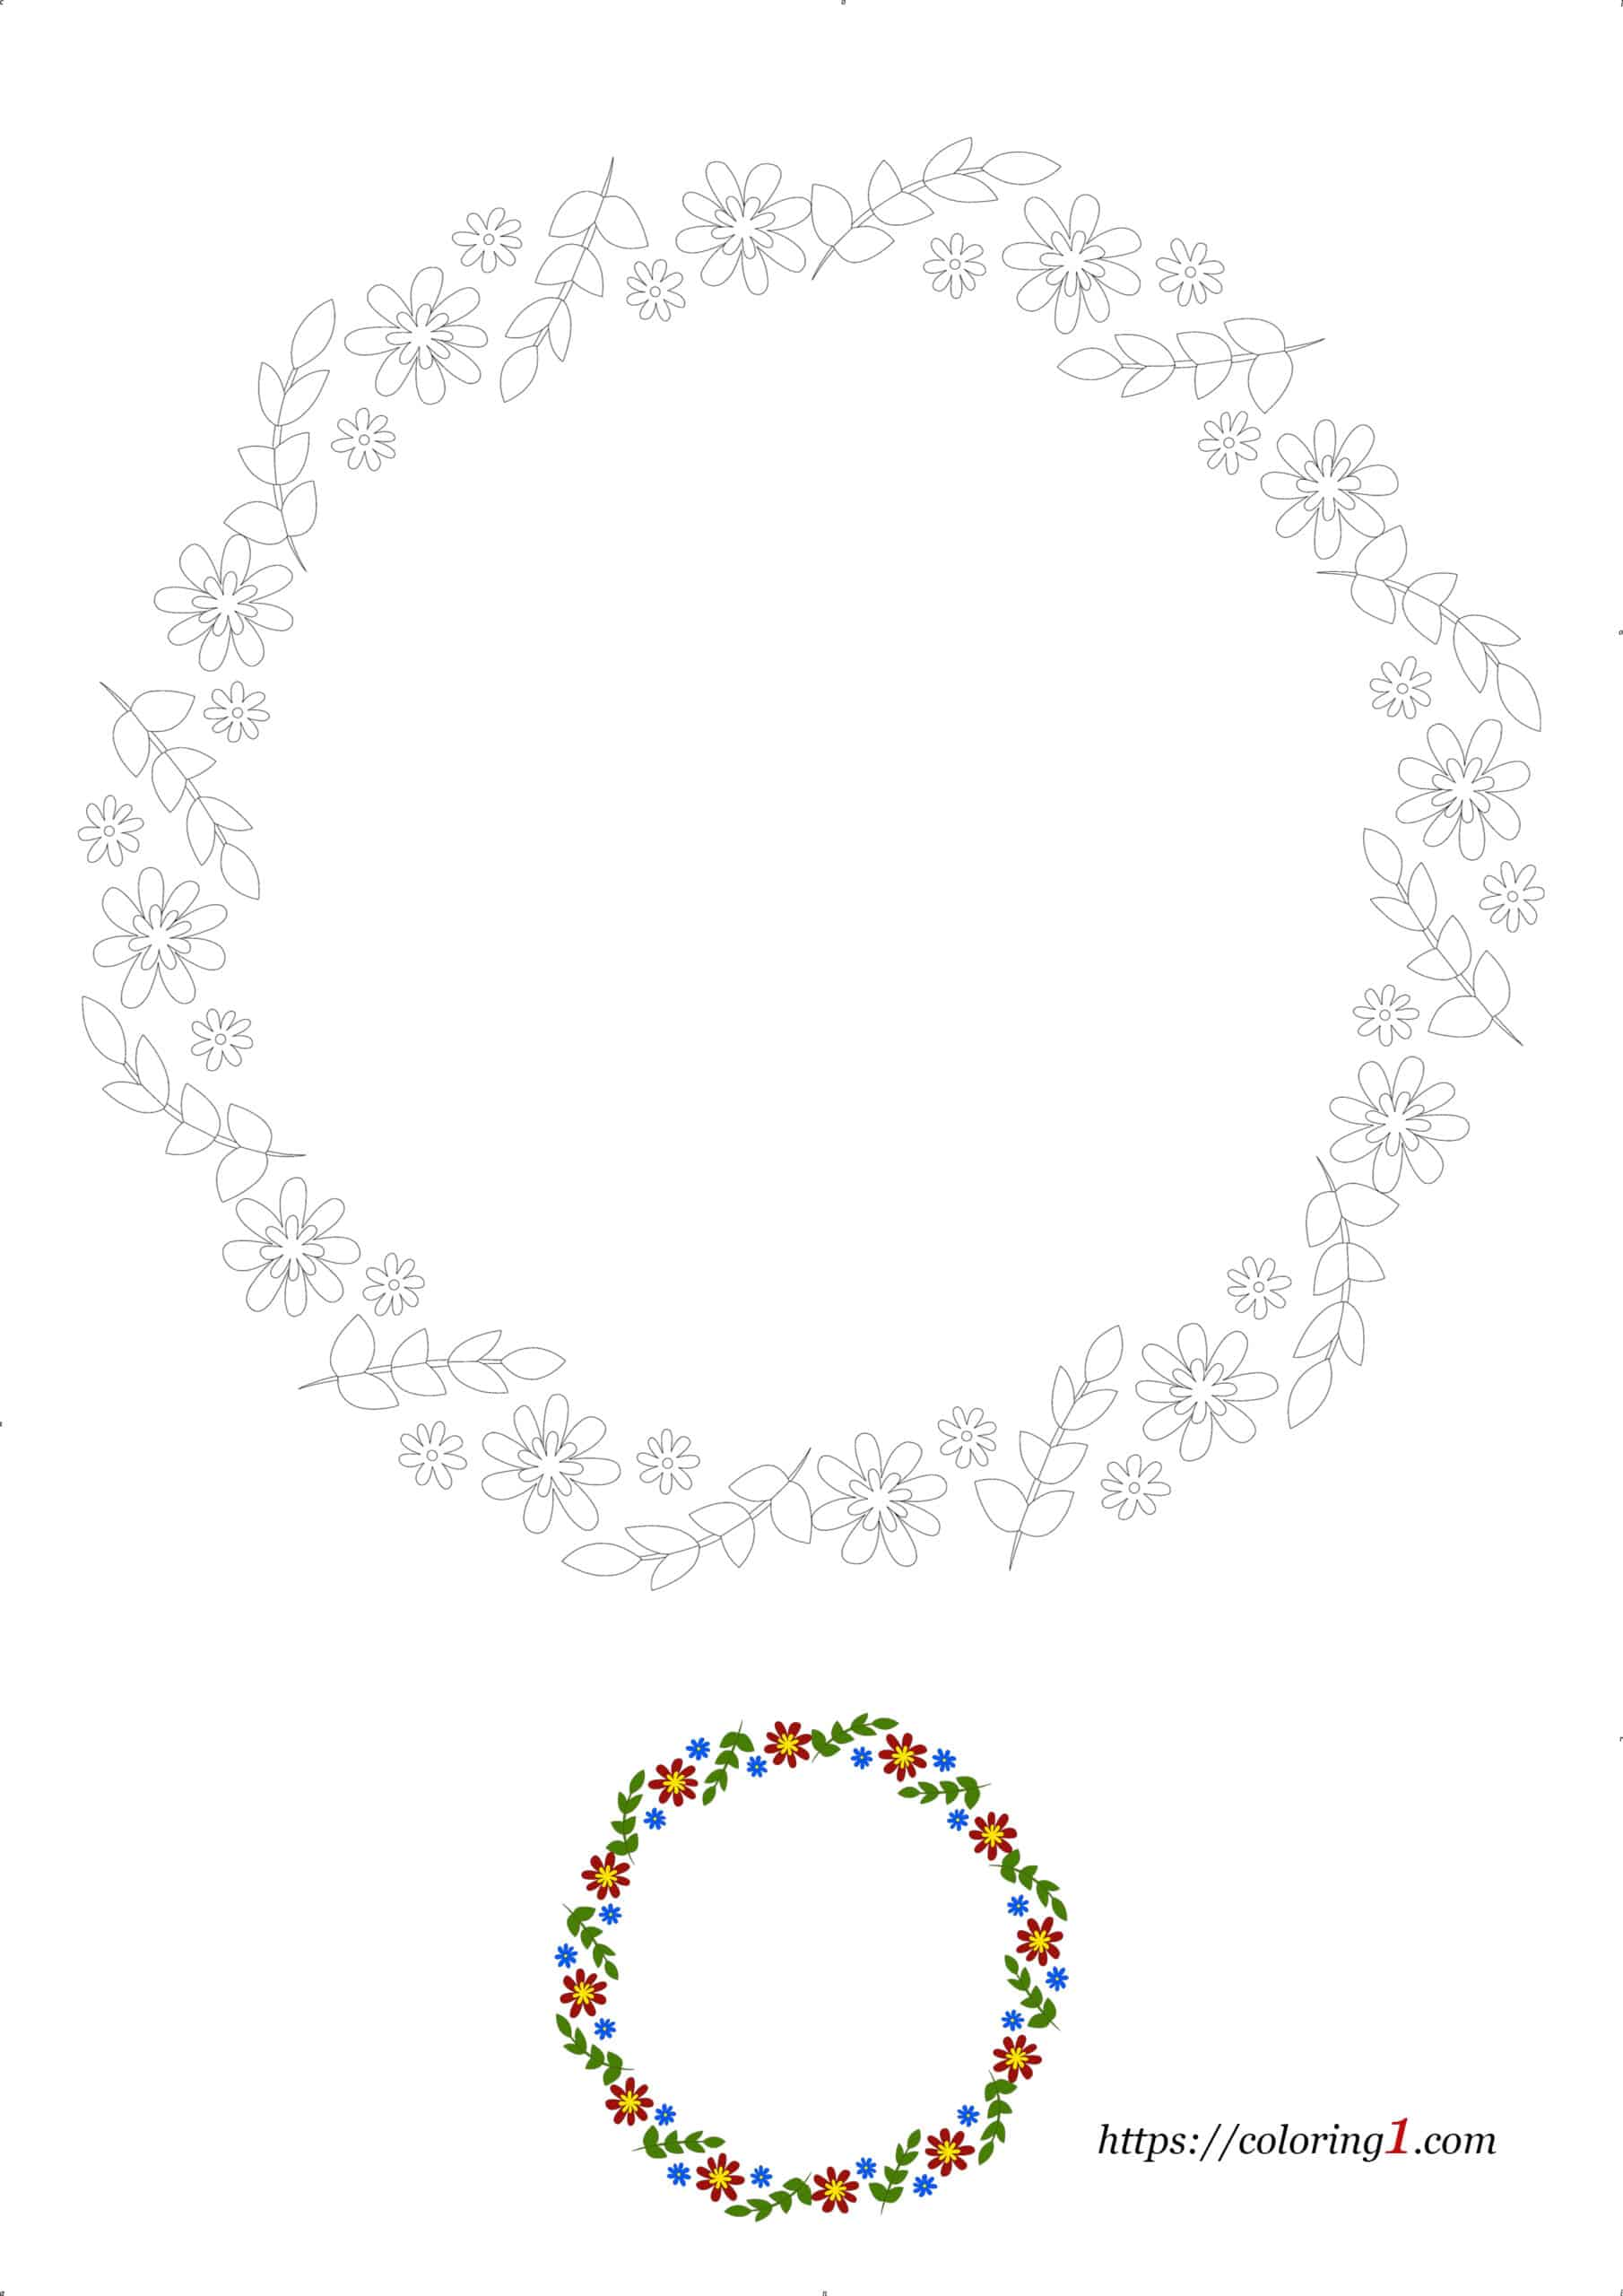 Coloriage Dessin Difficile Bordure de Fleurs